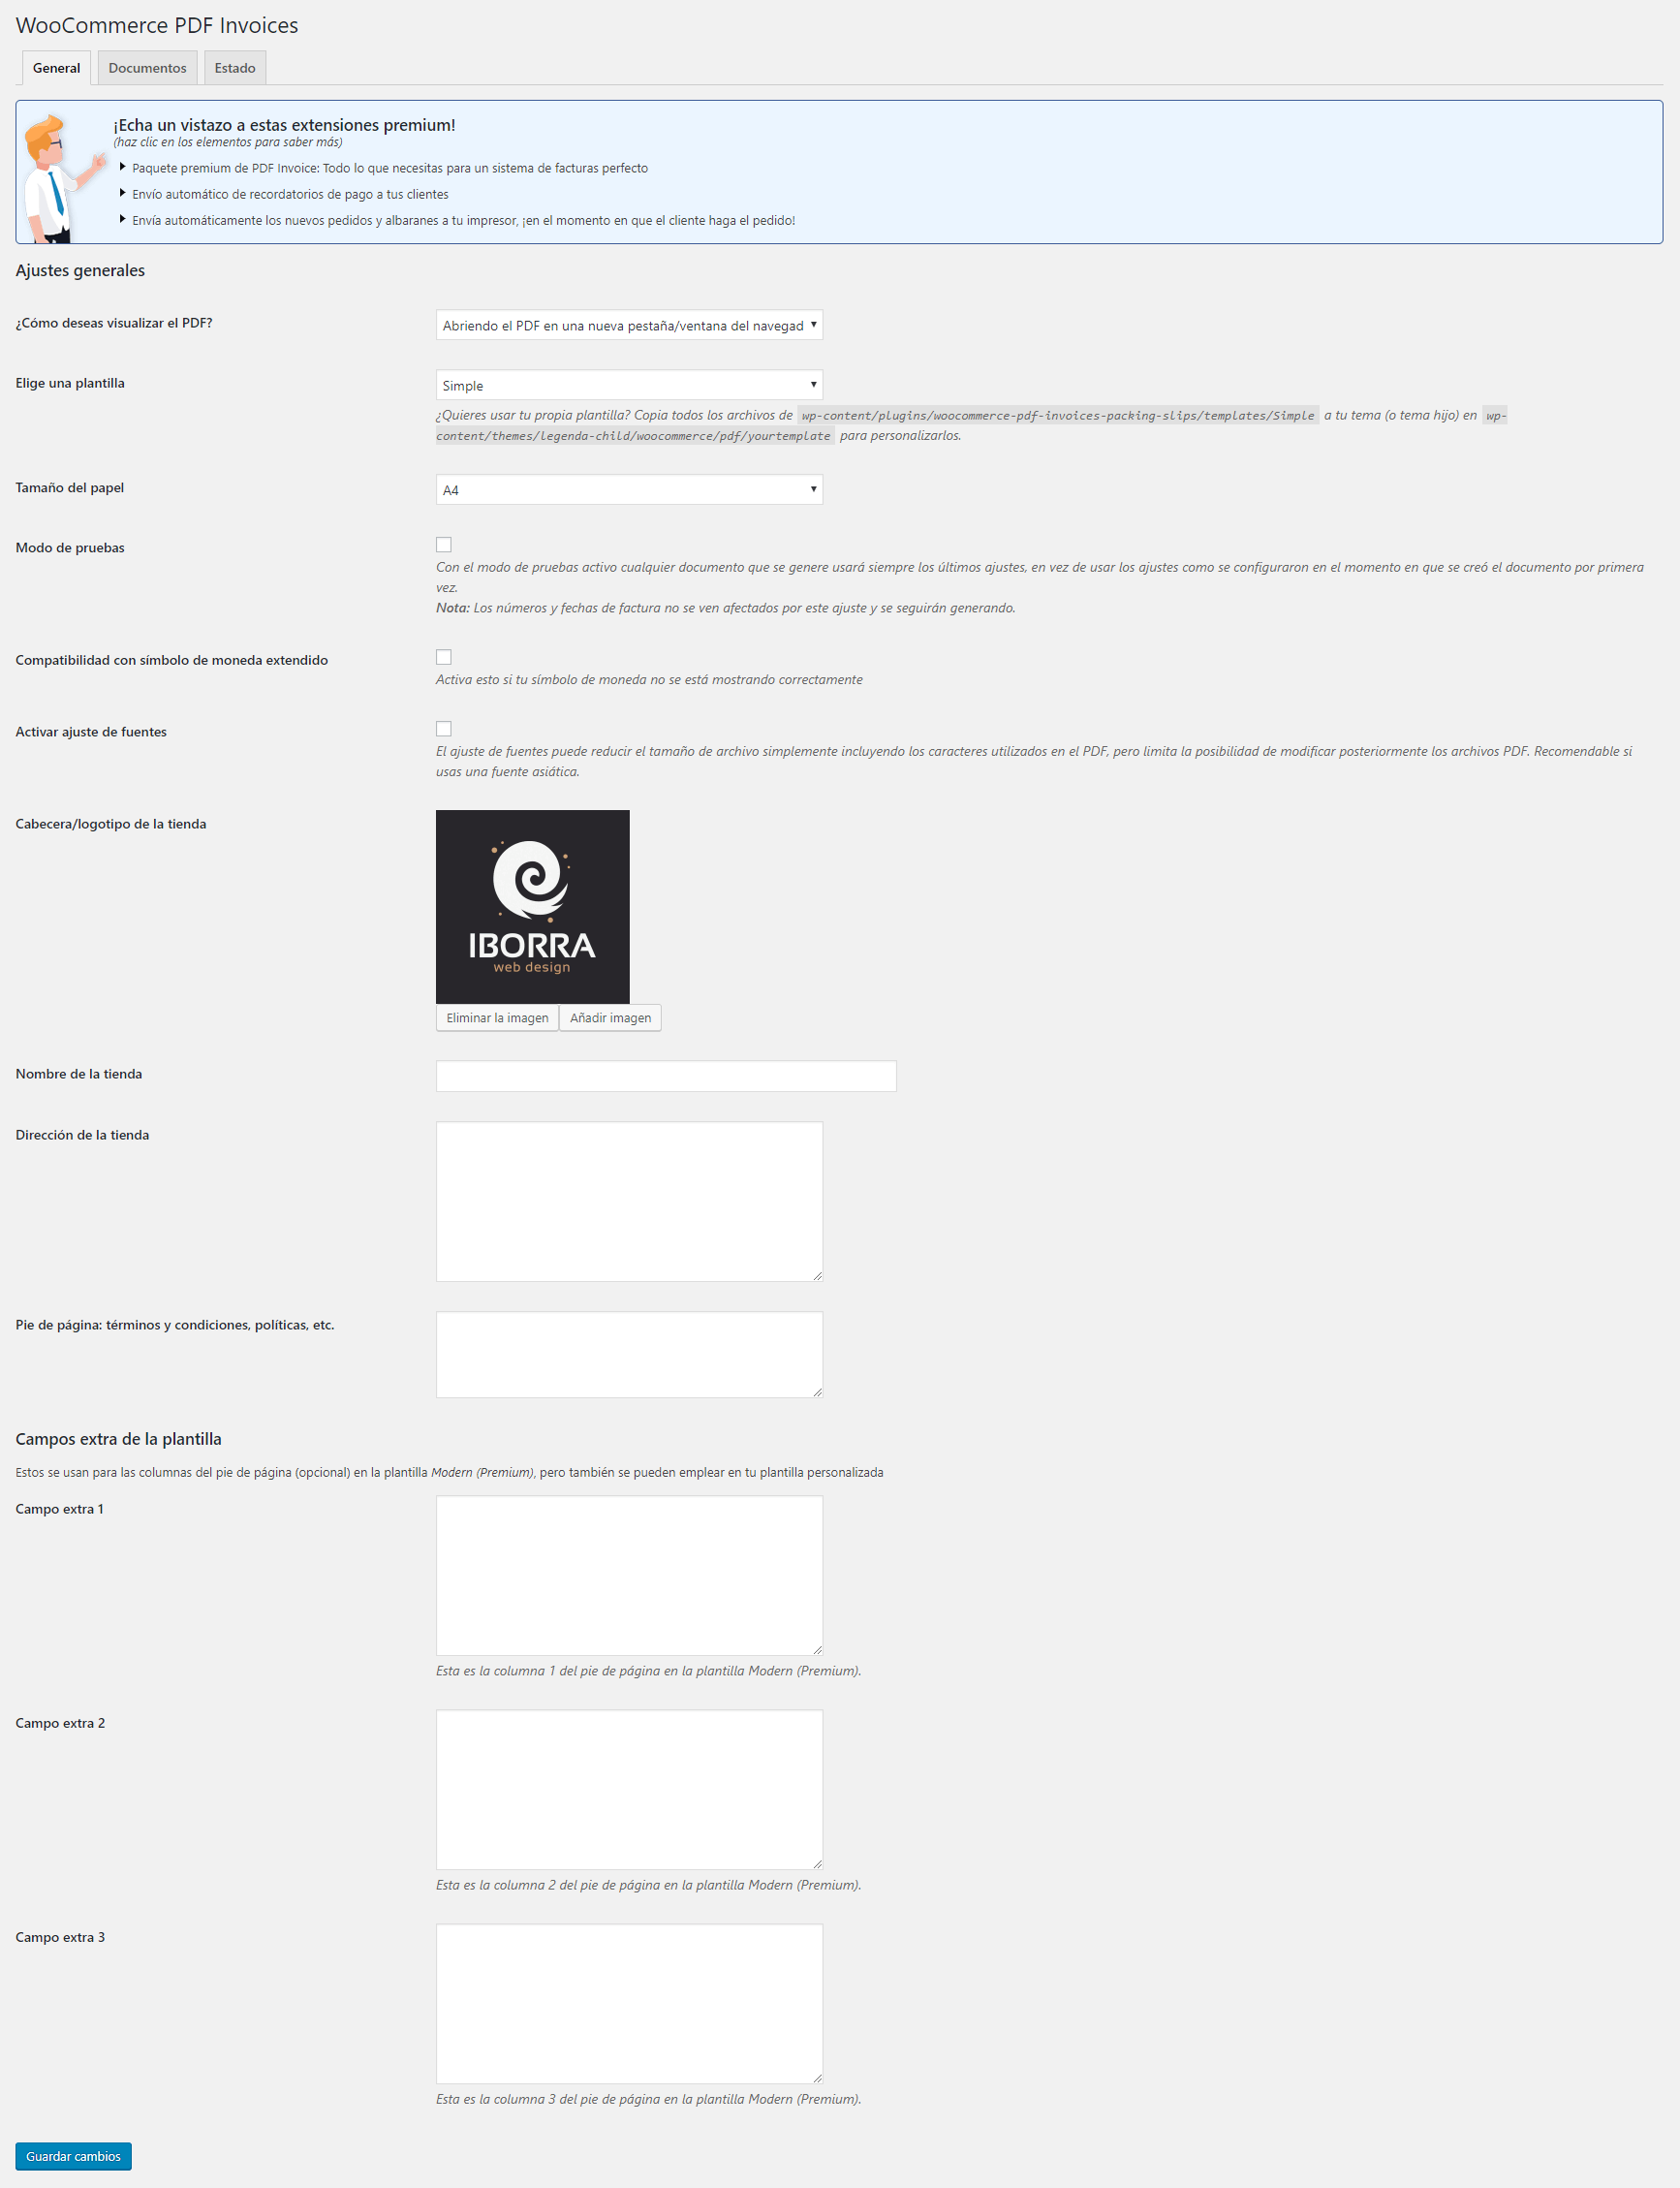 incluir dni y generar facturas pdf en woocommerce img4 - iborra web design